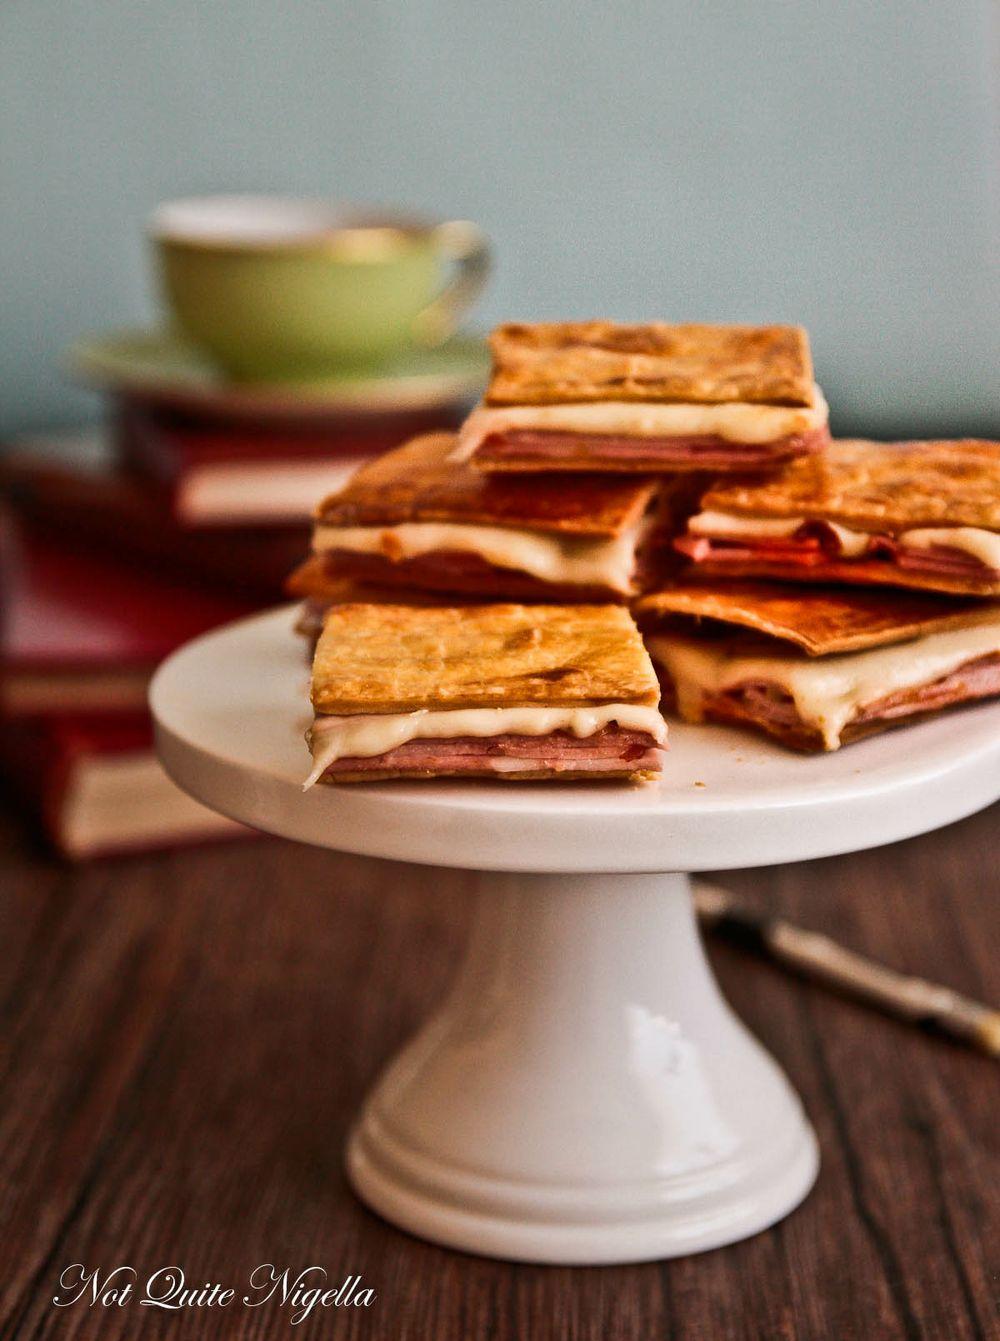 book-sandwiches-2-2